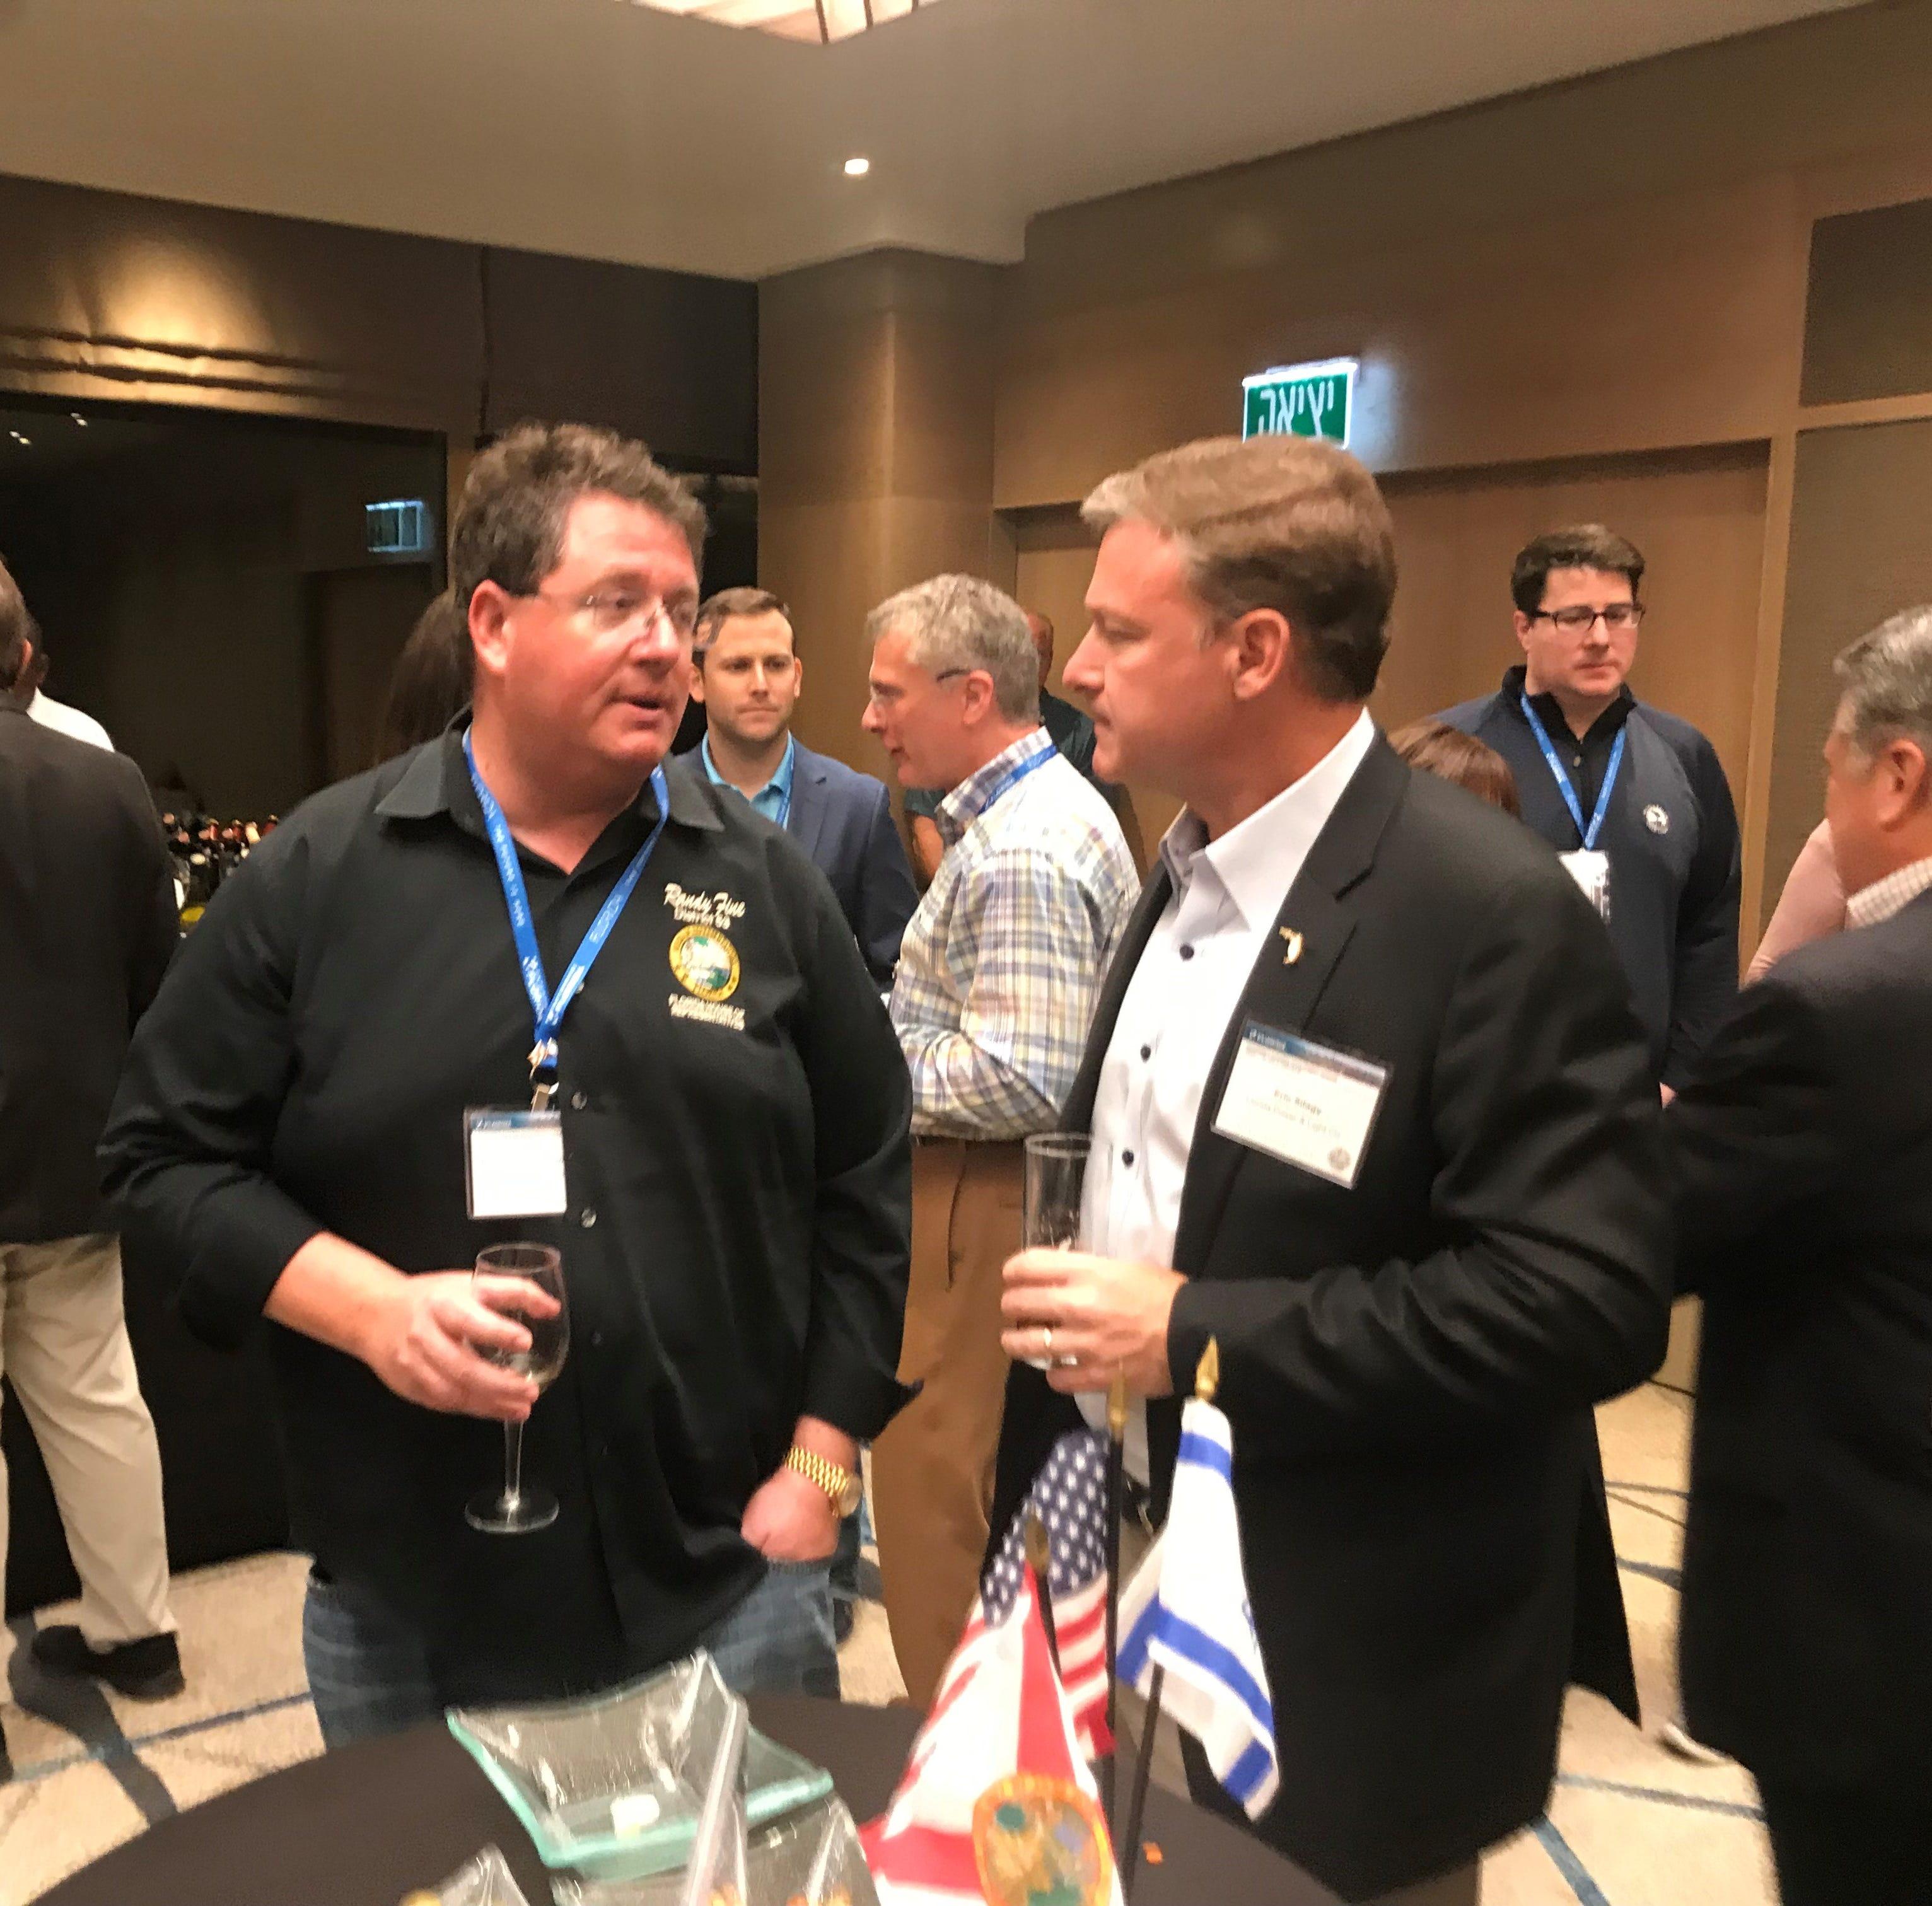 Economics intersect politics as Florida delegation arrives in Israel